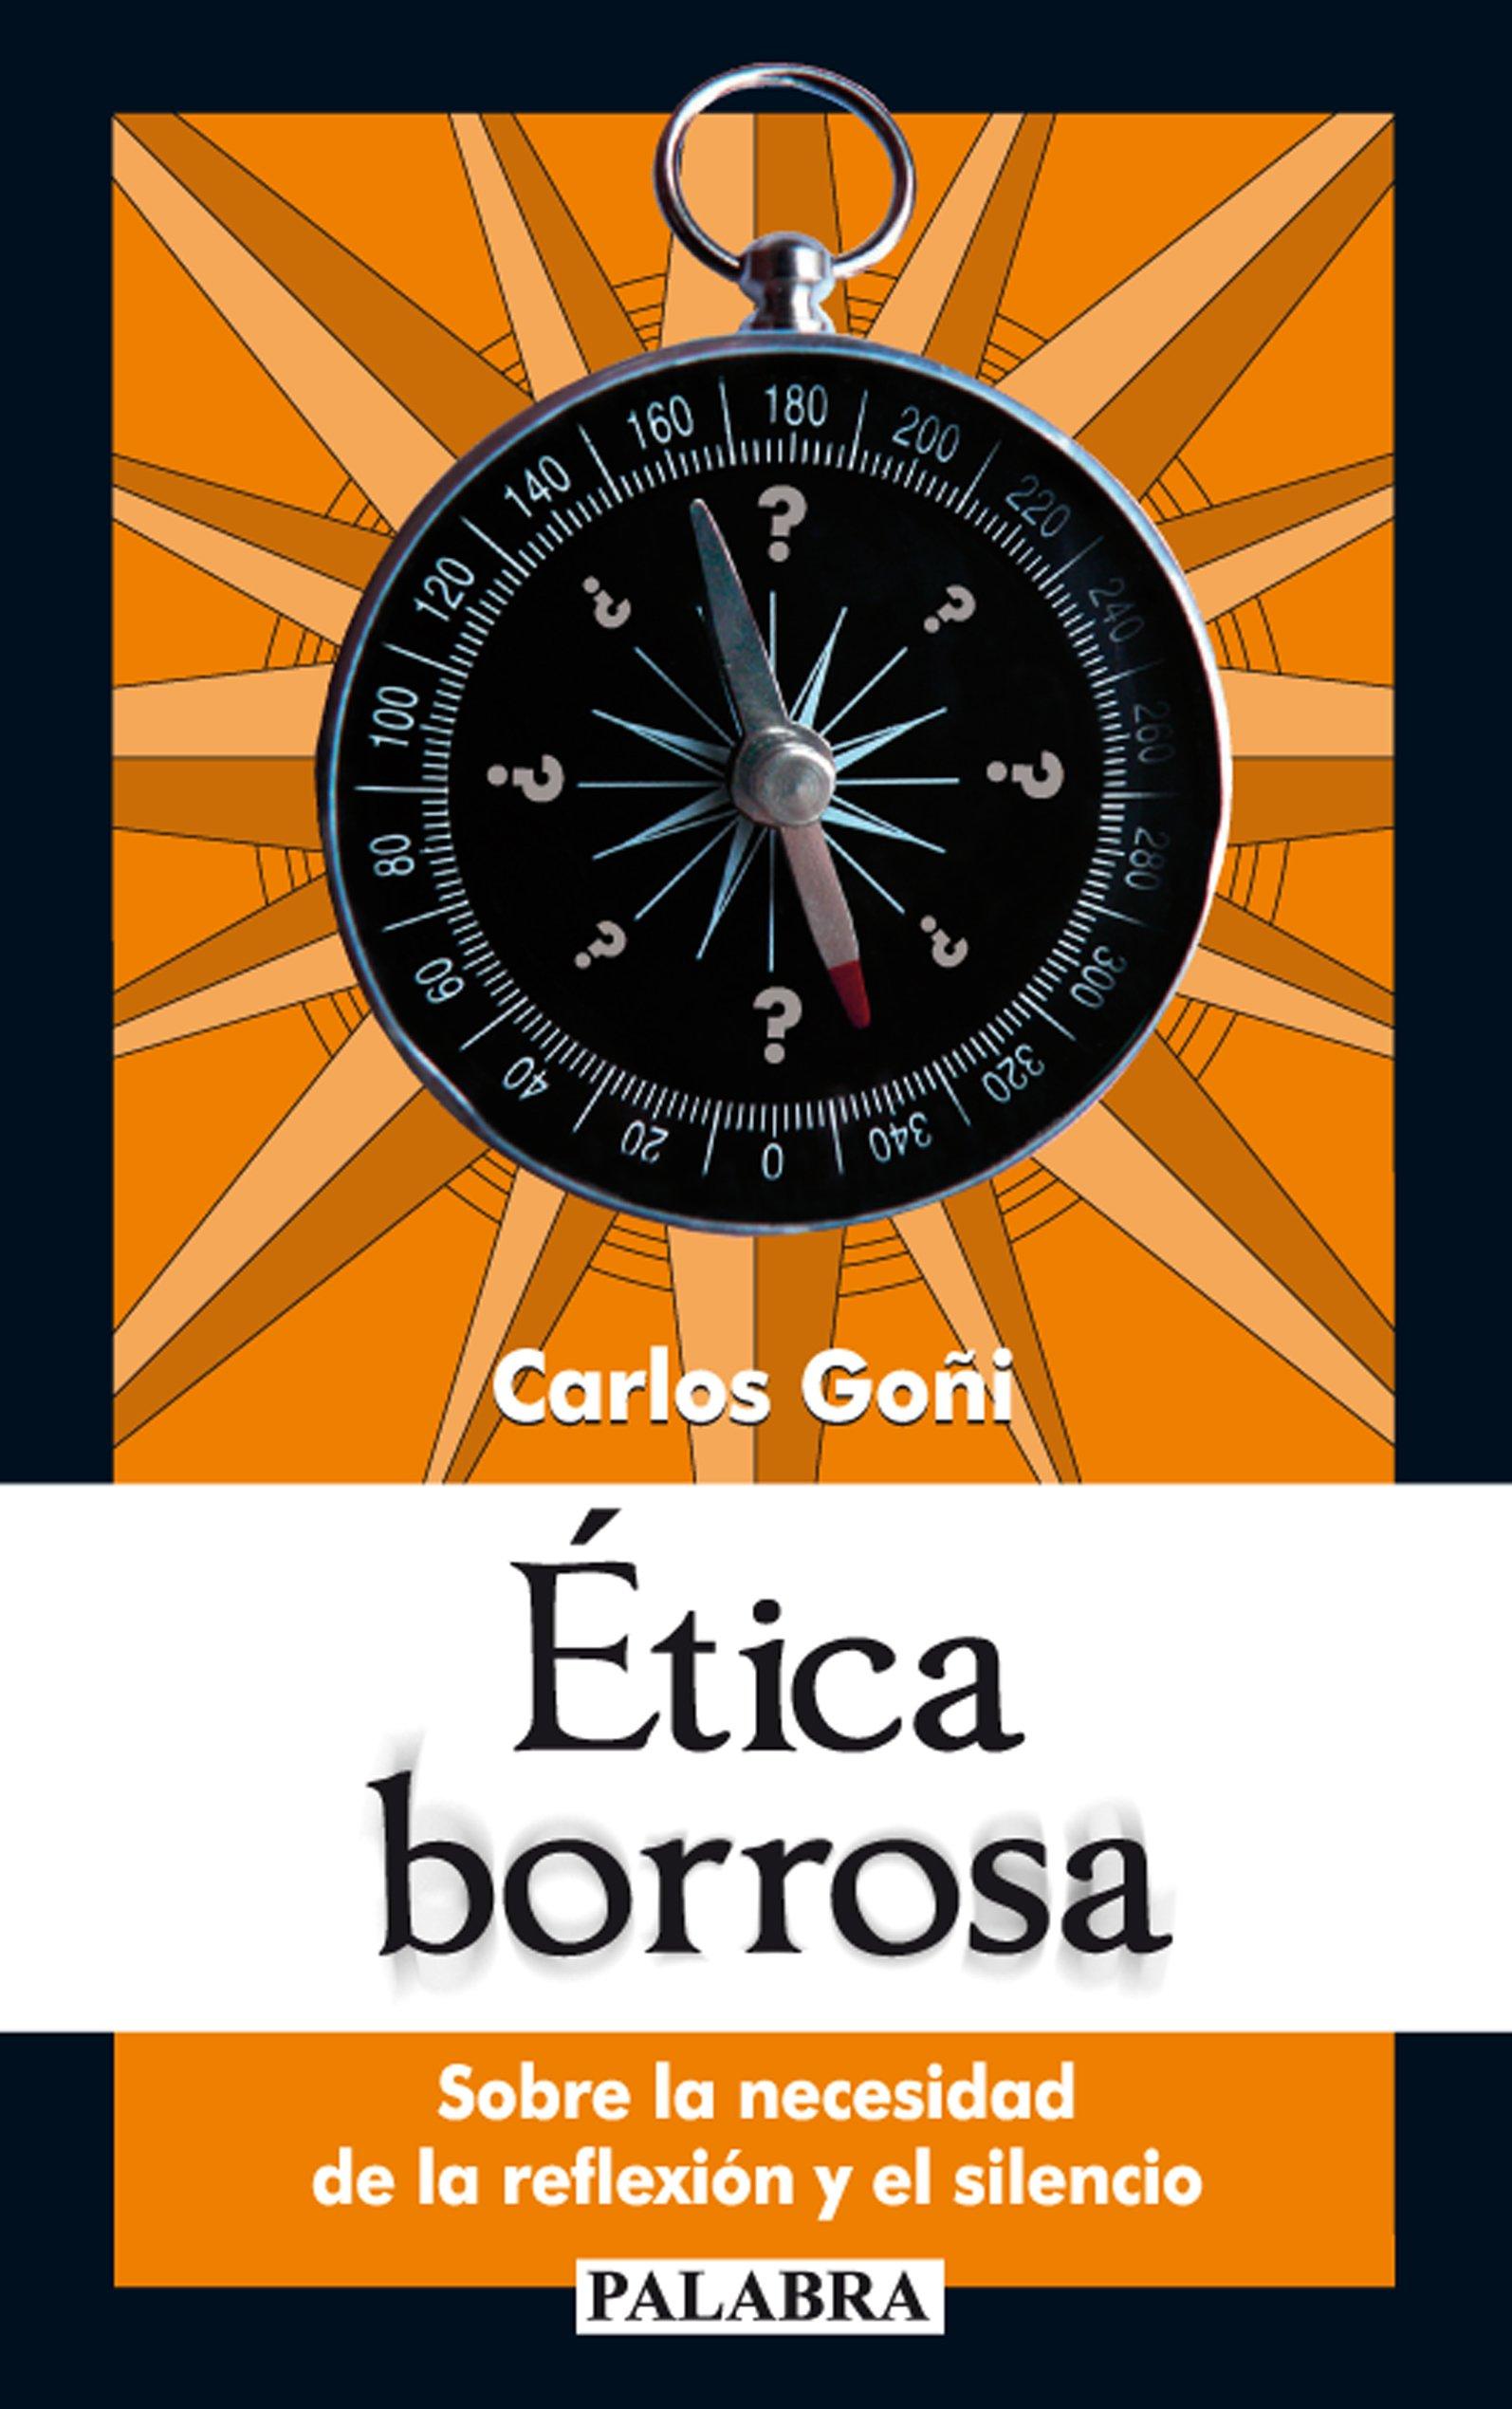 ETICA BORROSA (Spanish Edition): Carlos Goñi Zubieta: 9788498403718: Amazon.com: Books